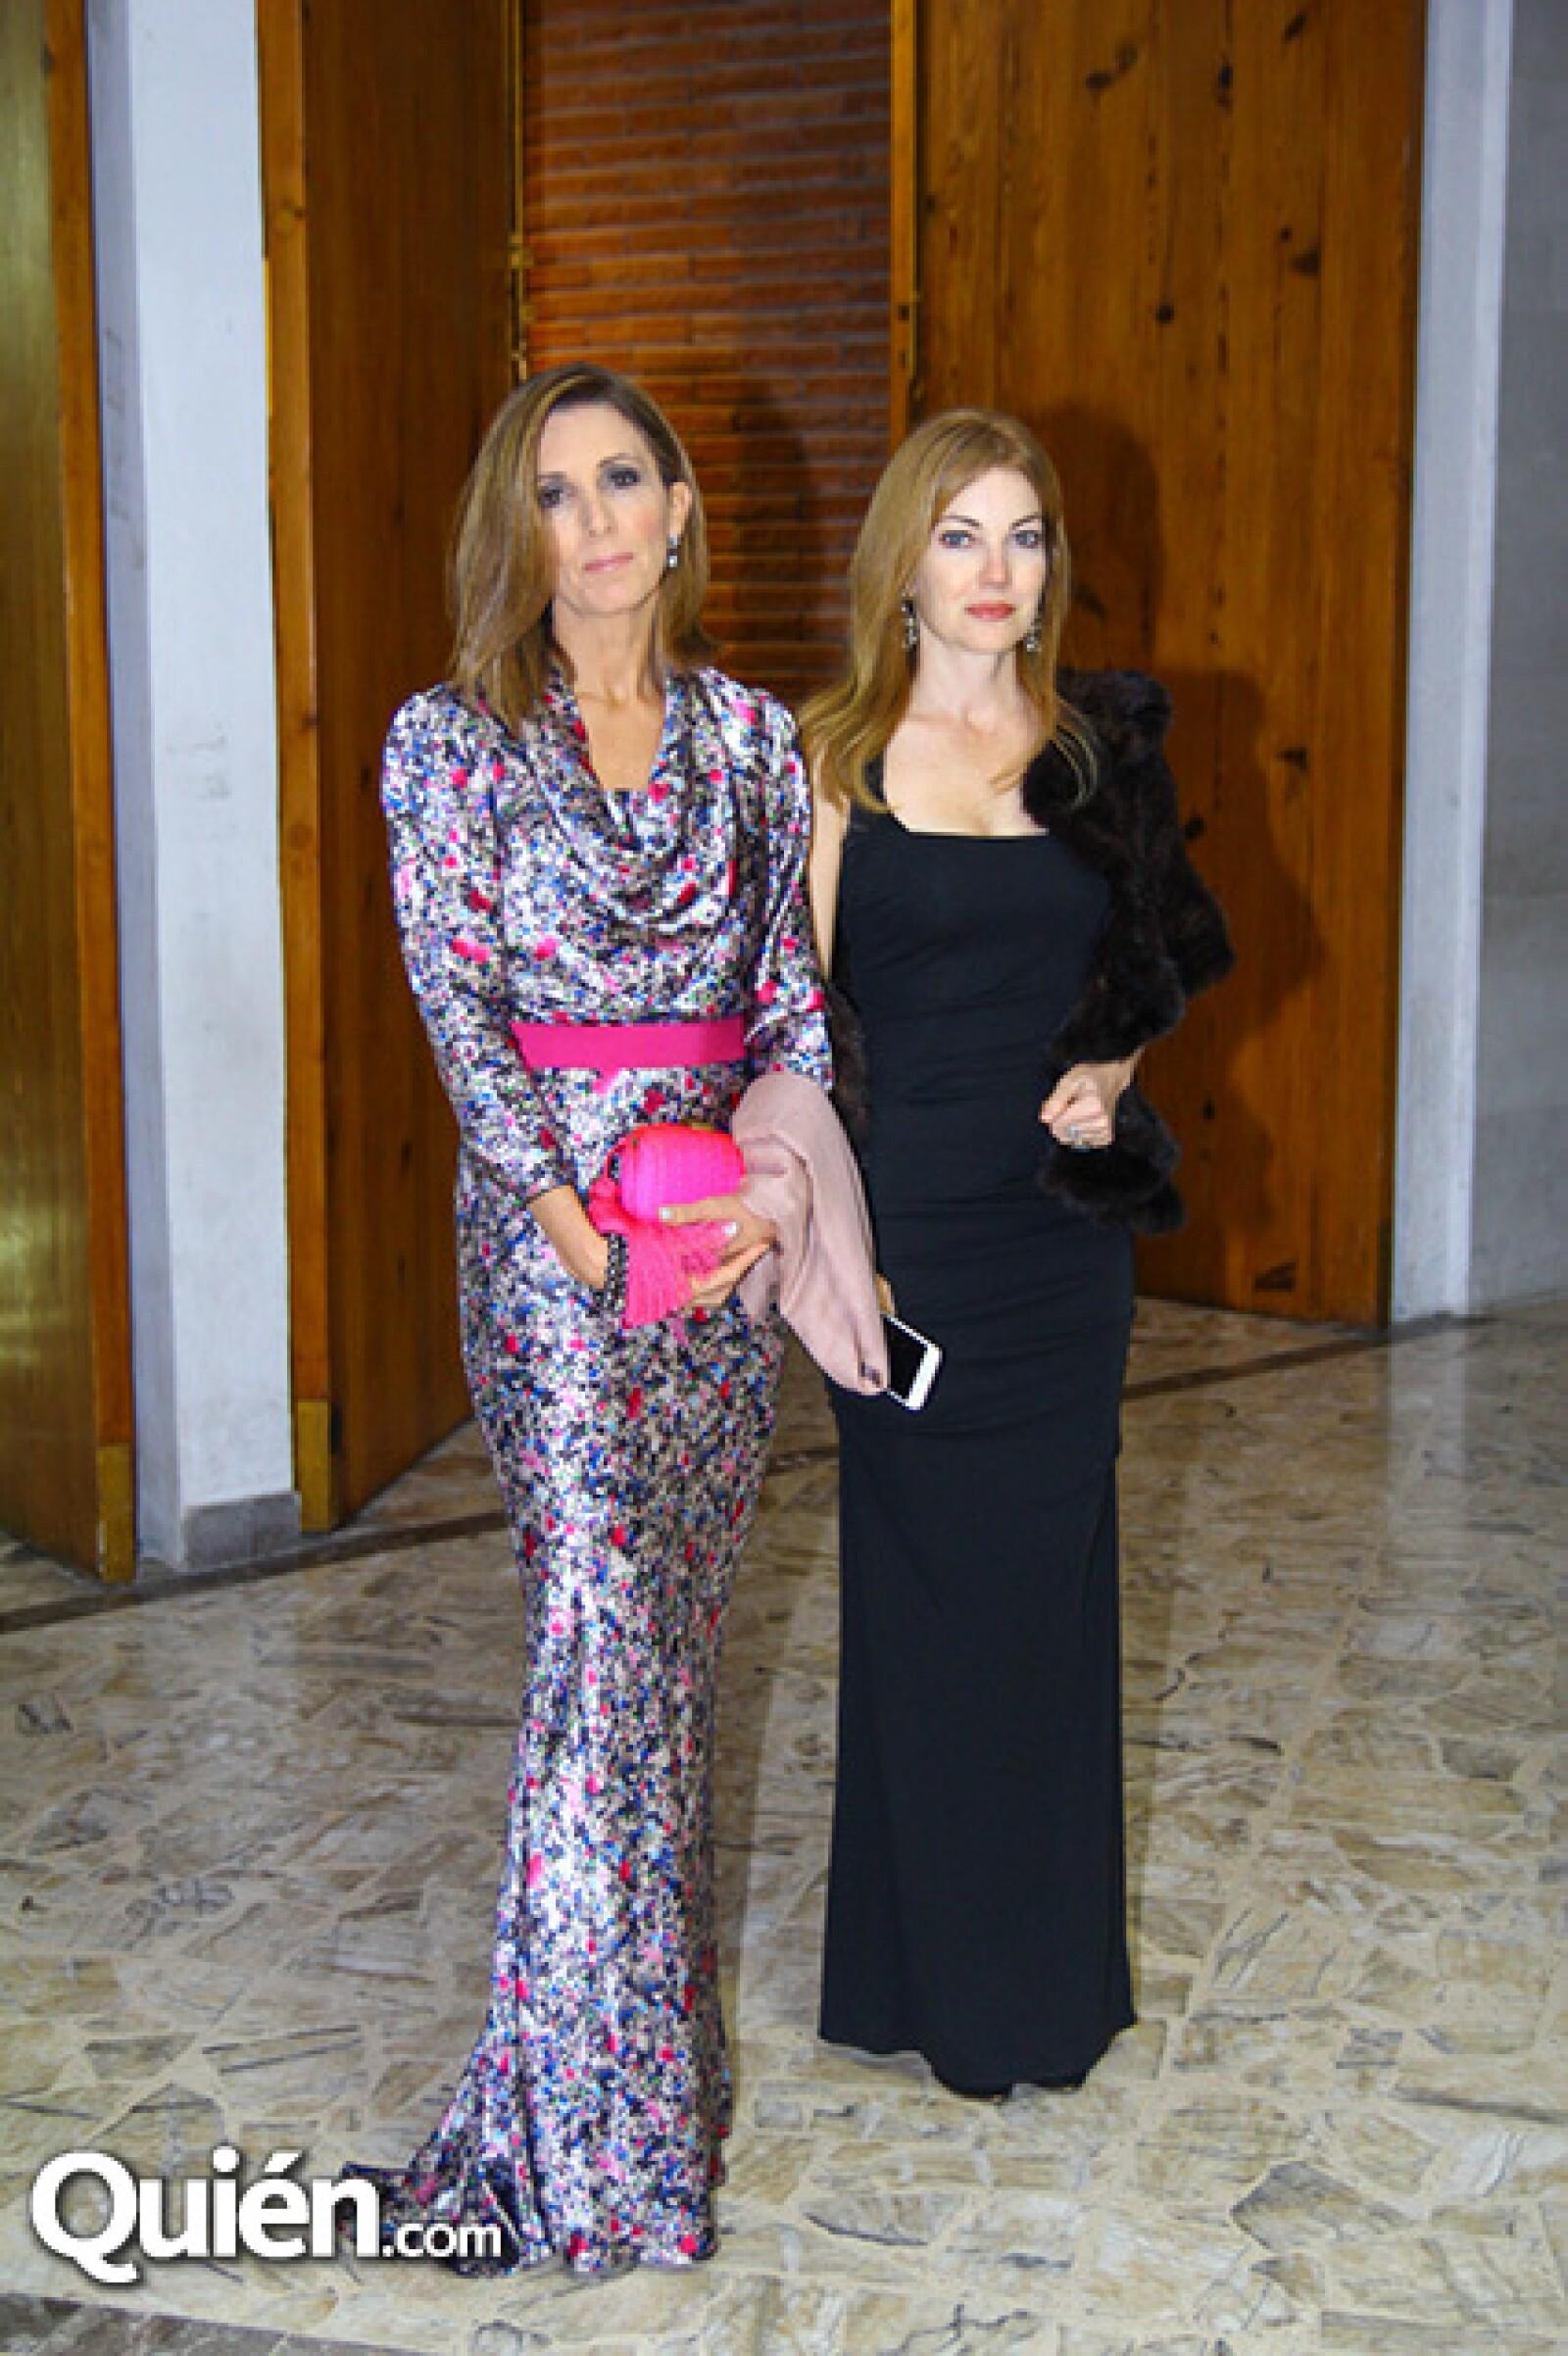 Pilar Madero de Frezzini y Alejandra Domínguez de Fernández